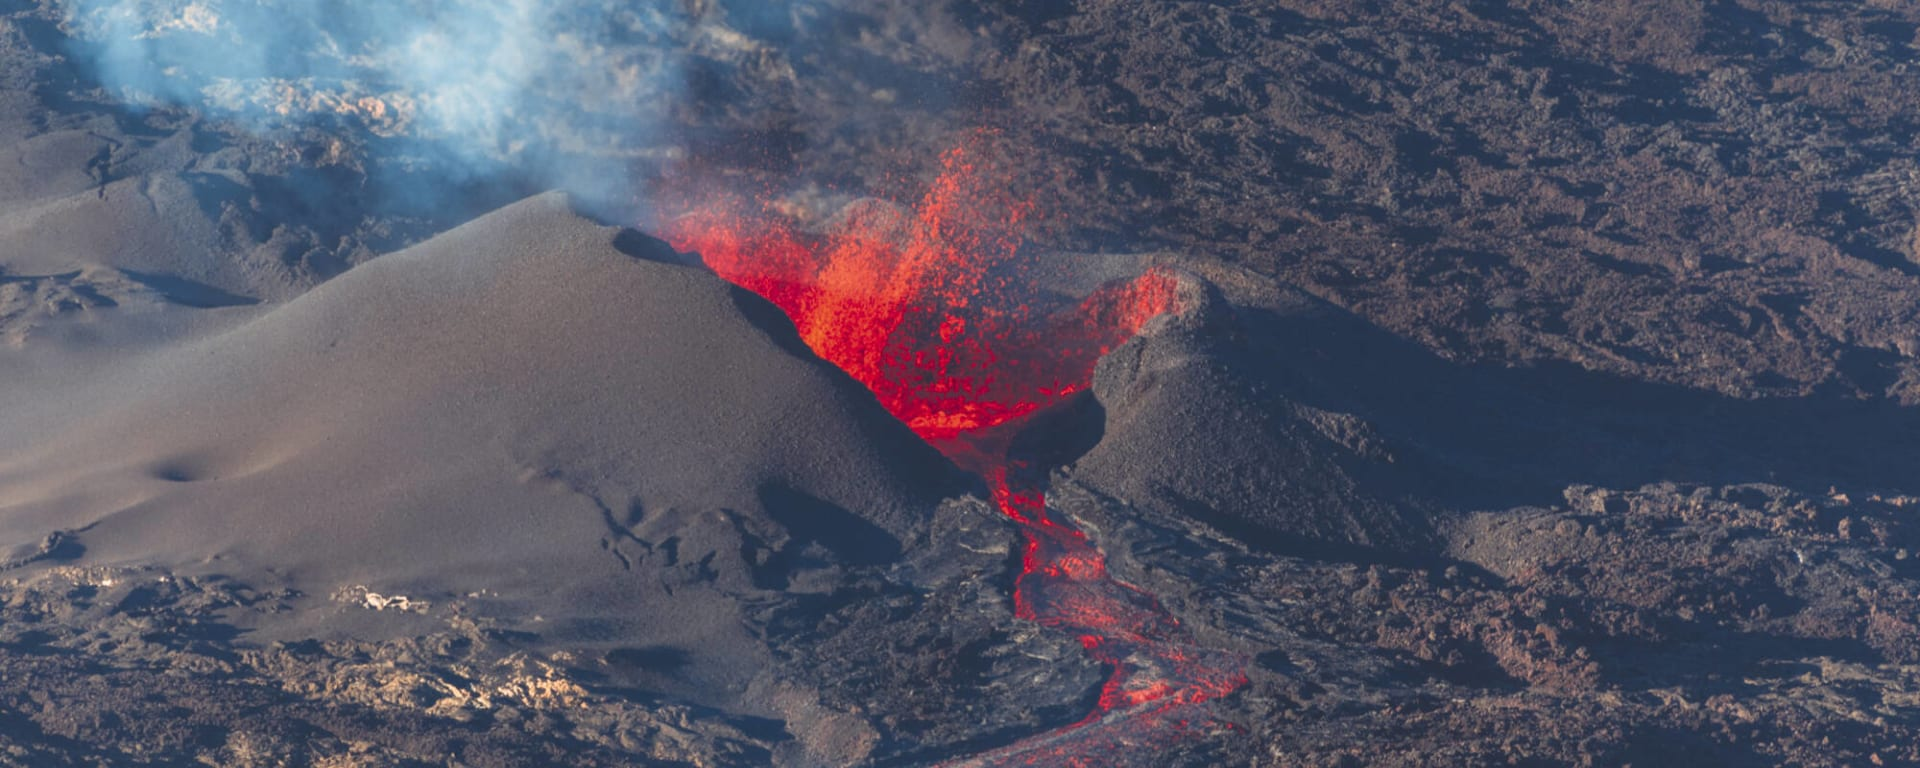 Höhepunkte La Réunion ab Küstenregion: Reunion Vulkan Caldera